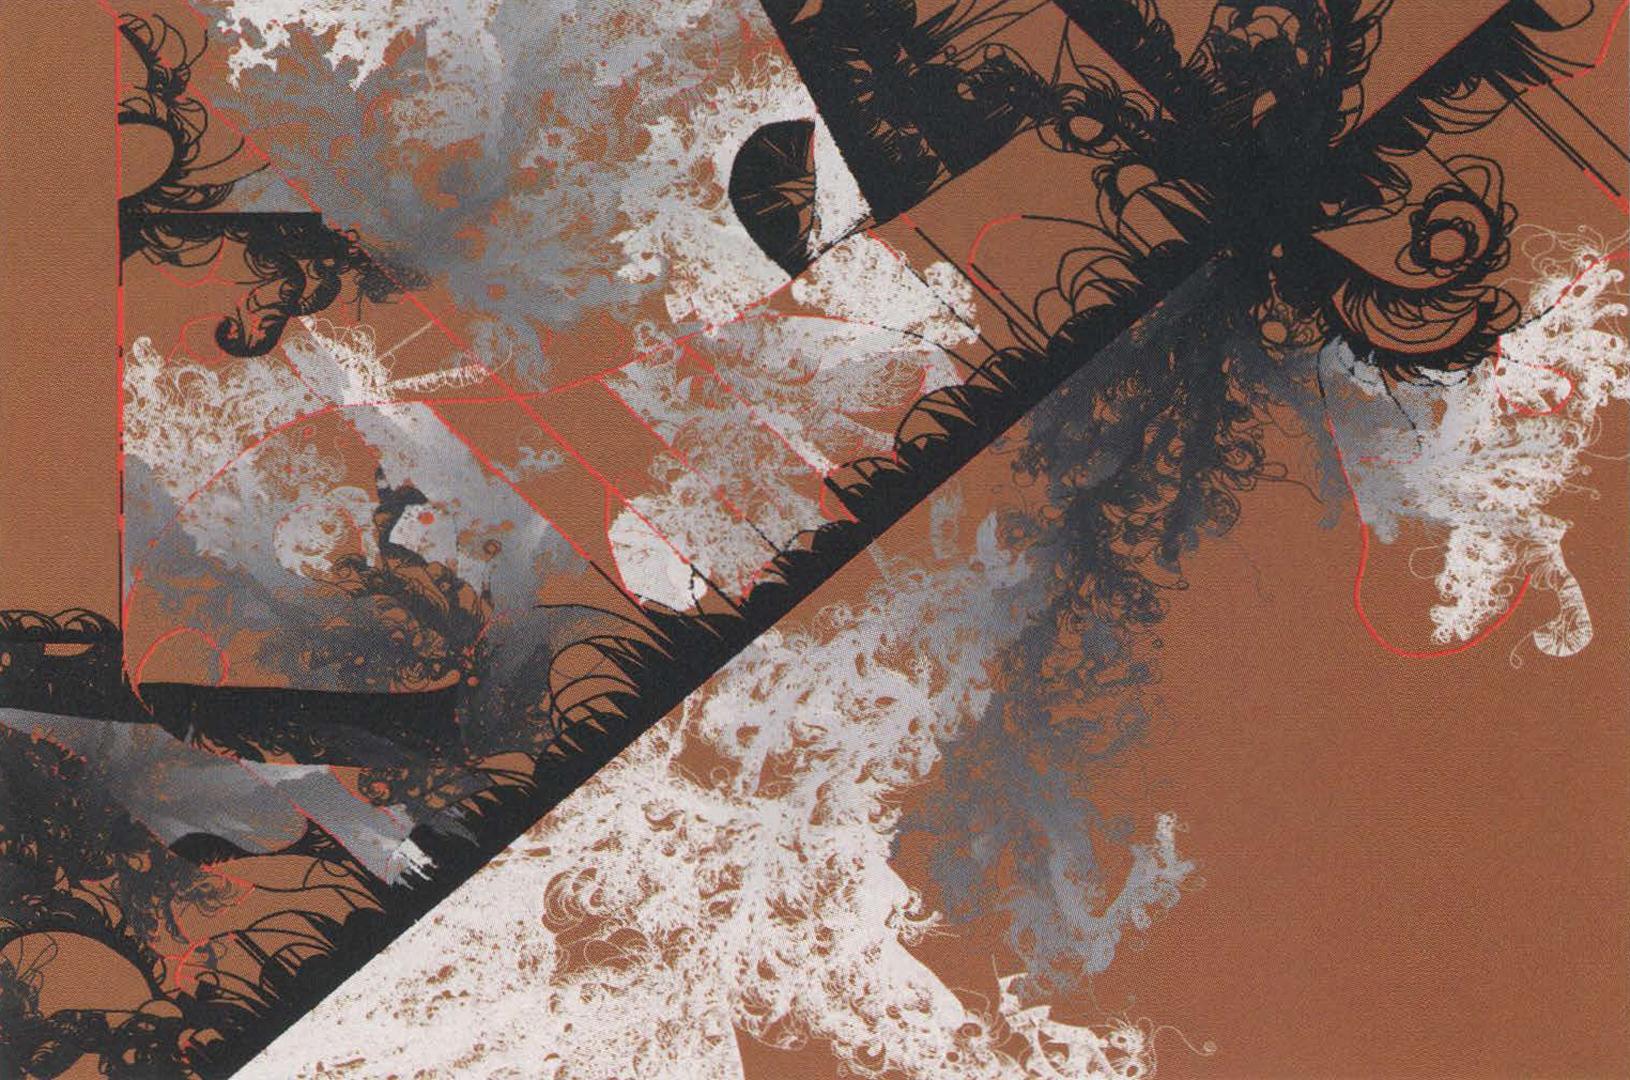 ©2000, Plancton Art Studio, Relazioni Emergenti